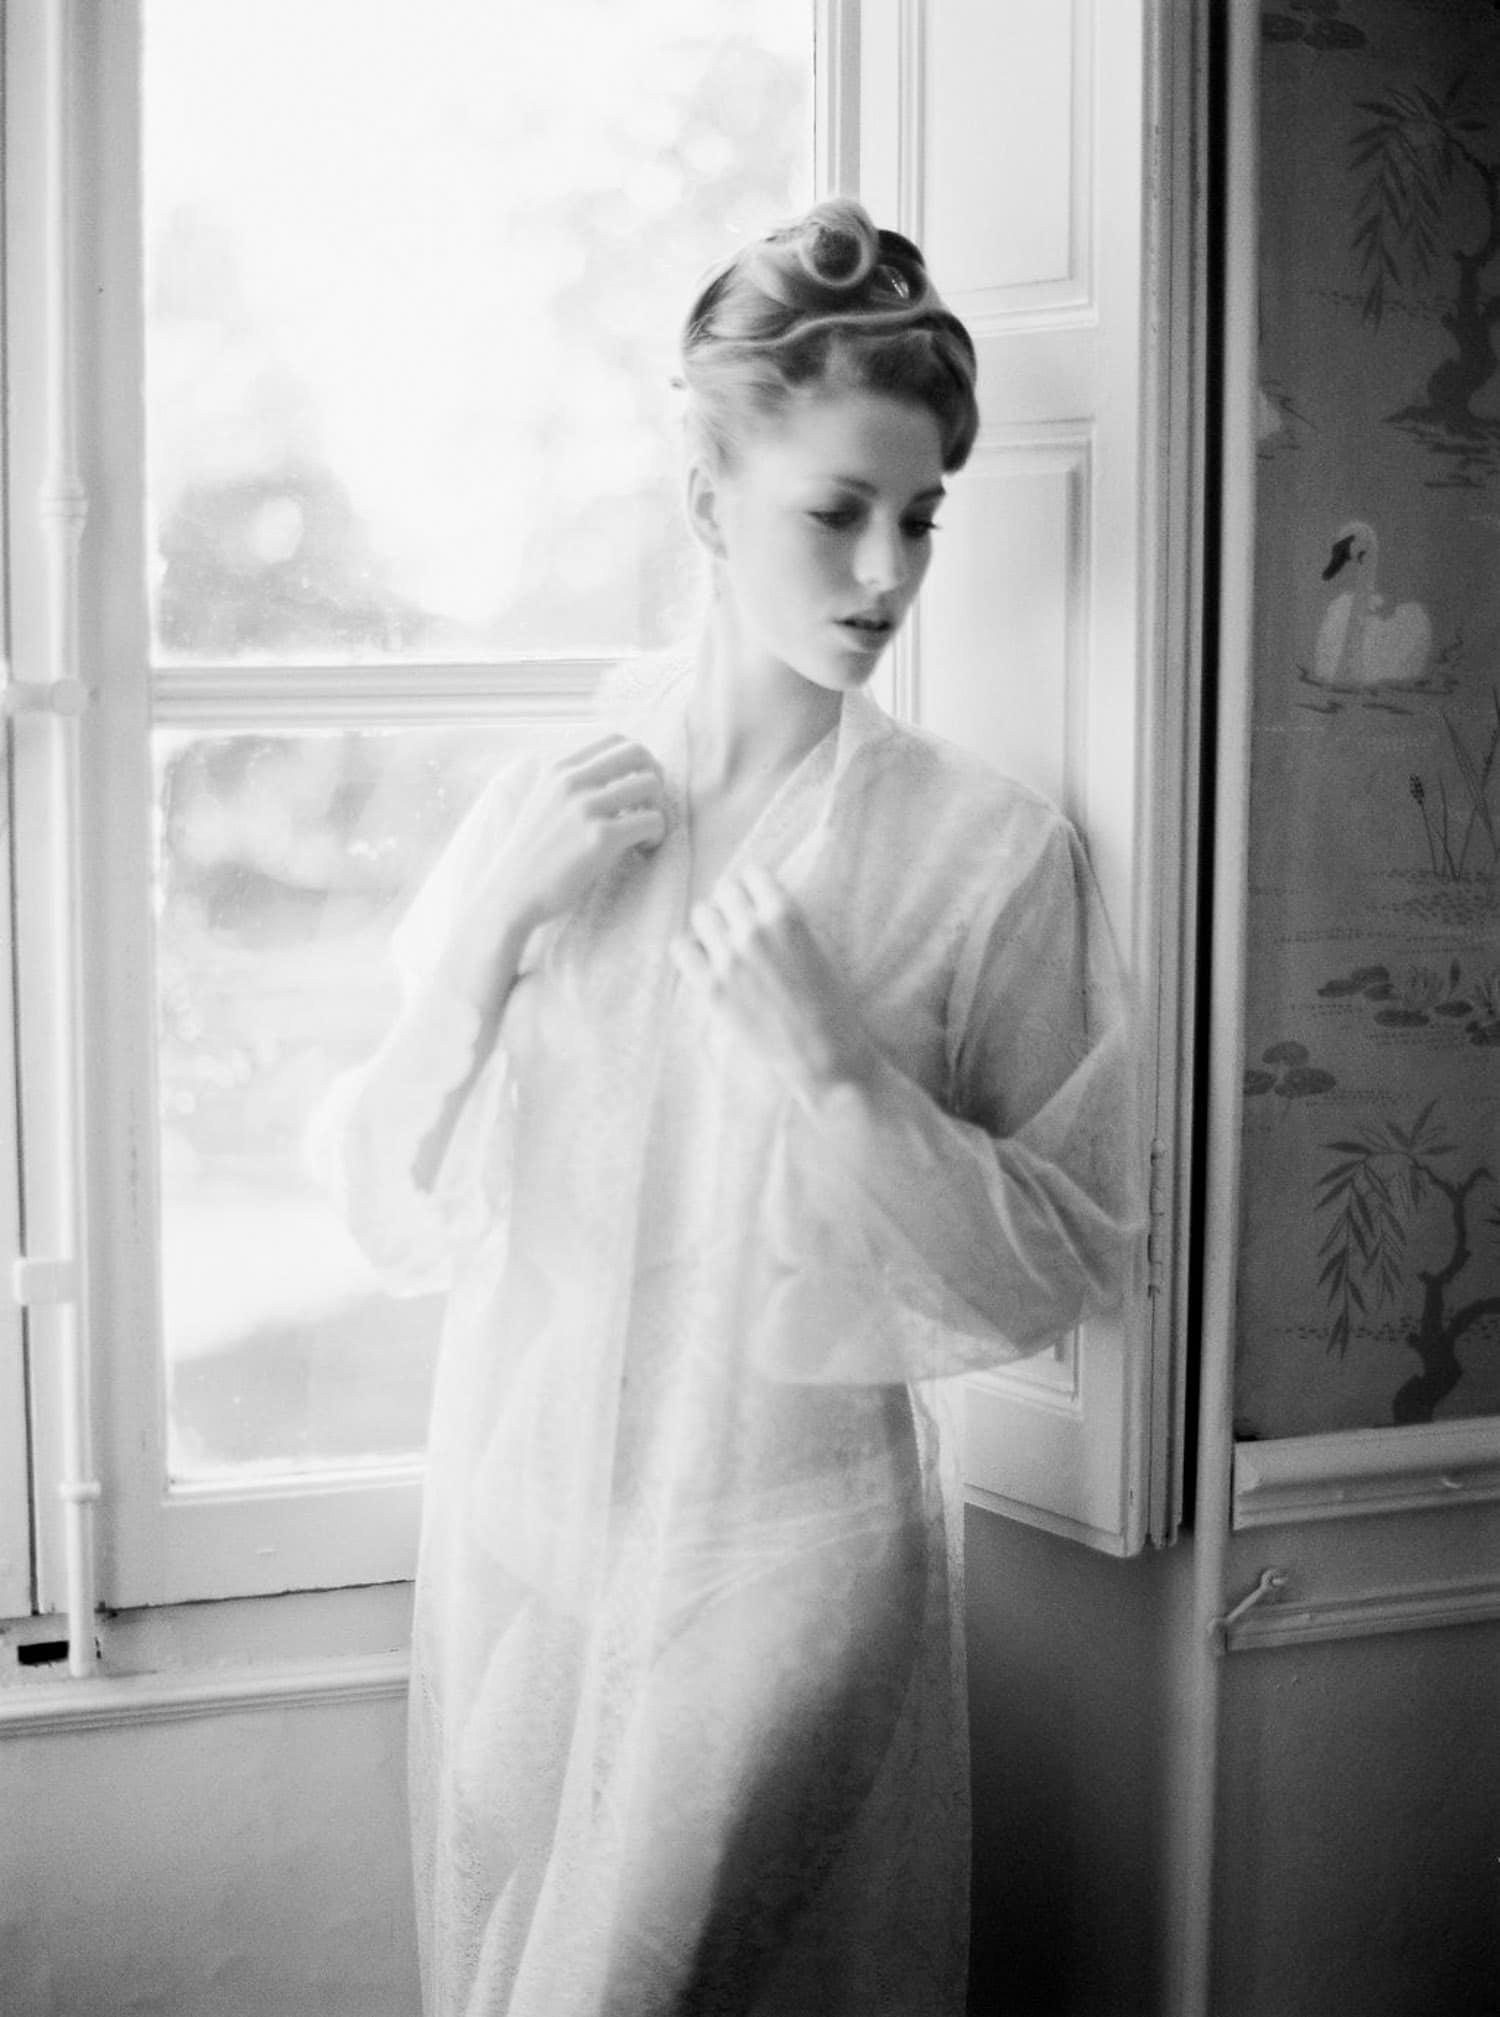 bridal boudoir session, elegant, fineart, veronique lorre, luxury wedding, Marseille, wedding designer